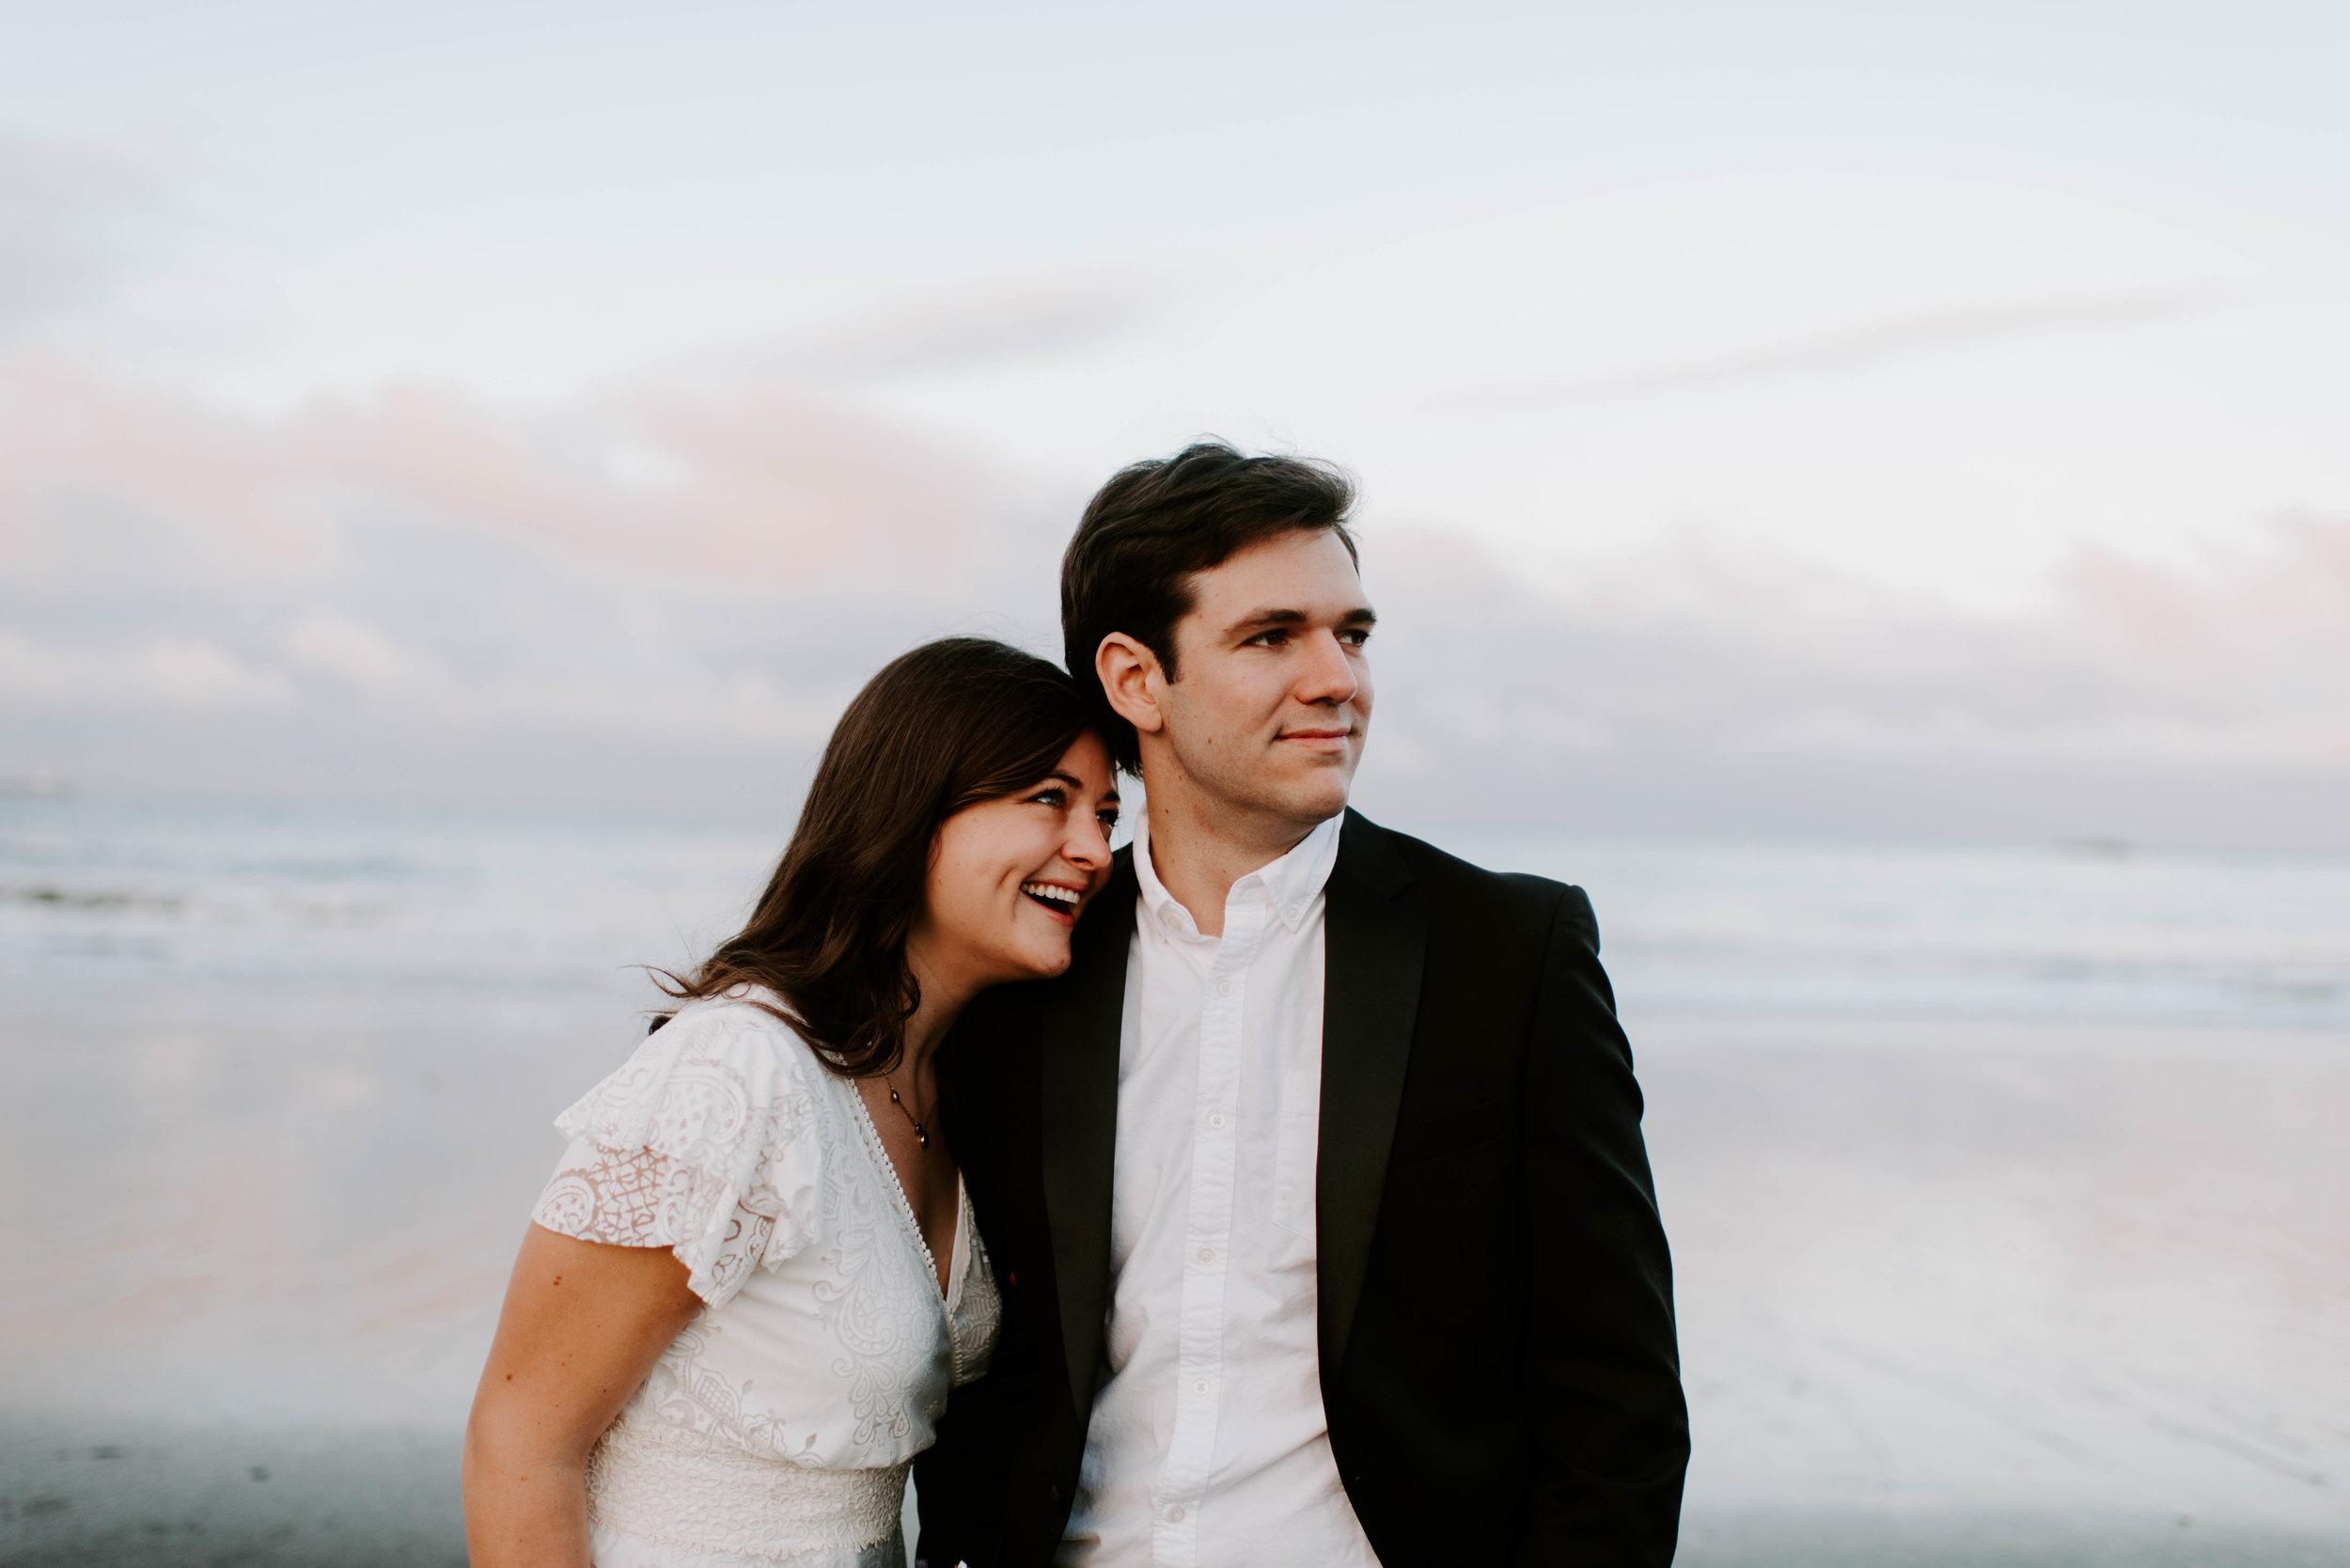 maryandnick_couplessession_cdupont-24.jpg